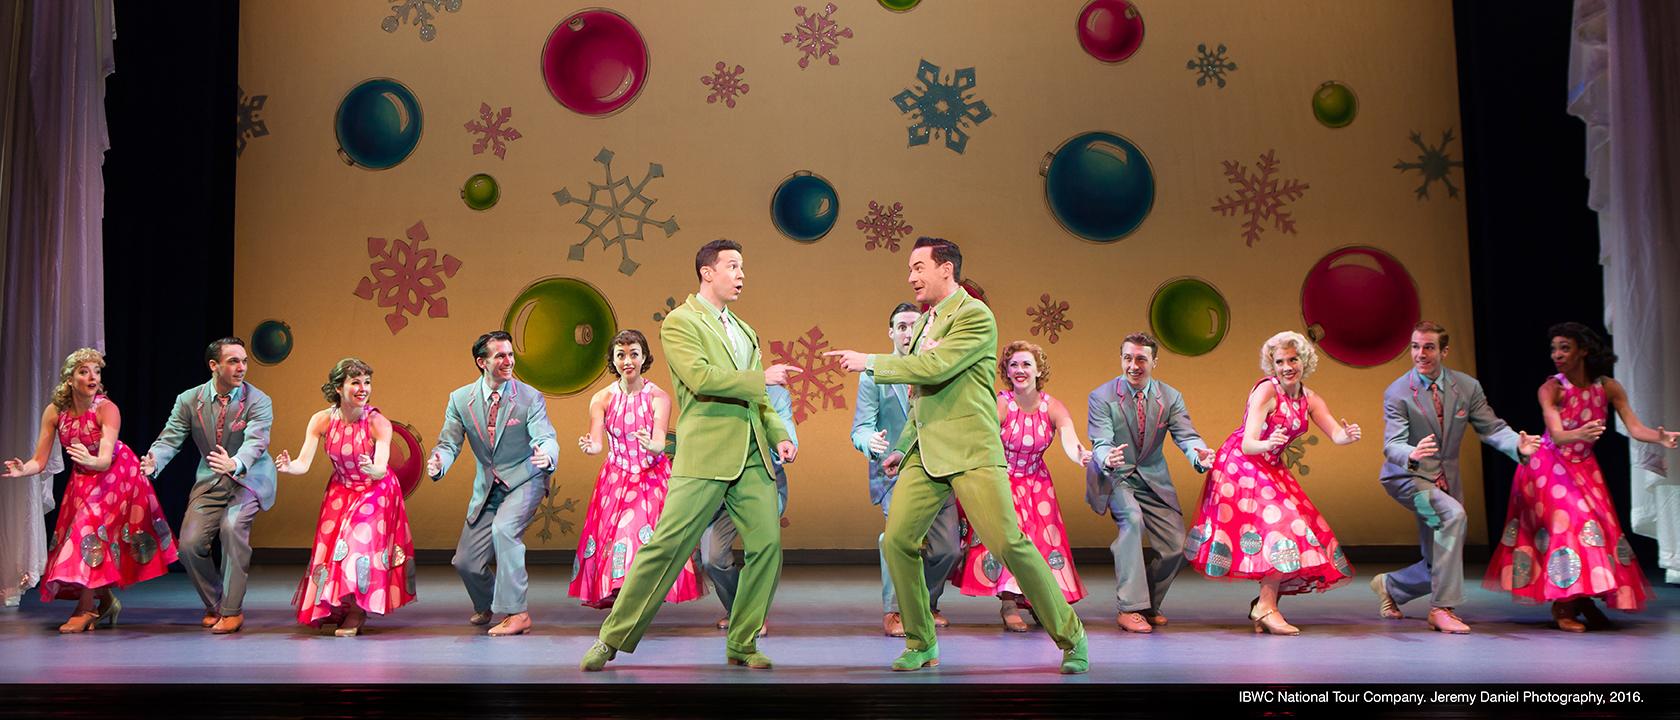 White Christmas In Theaters.Washington Pavilion Washington Pavilion